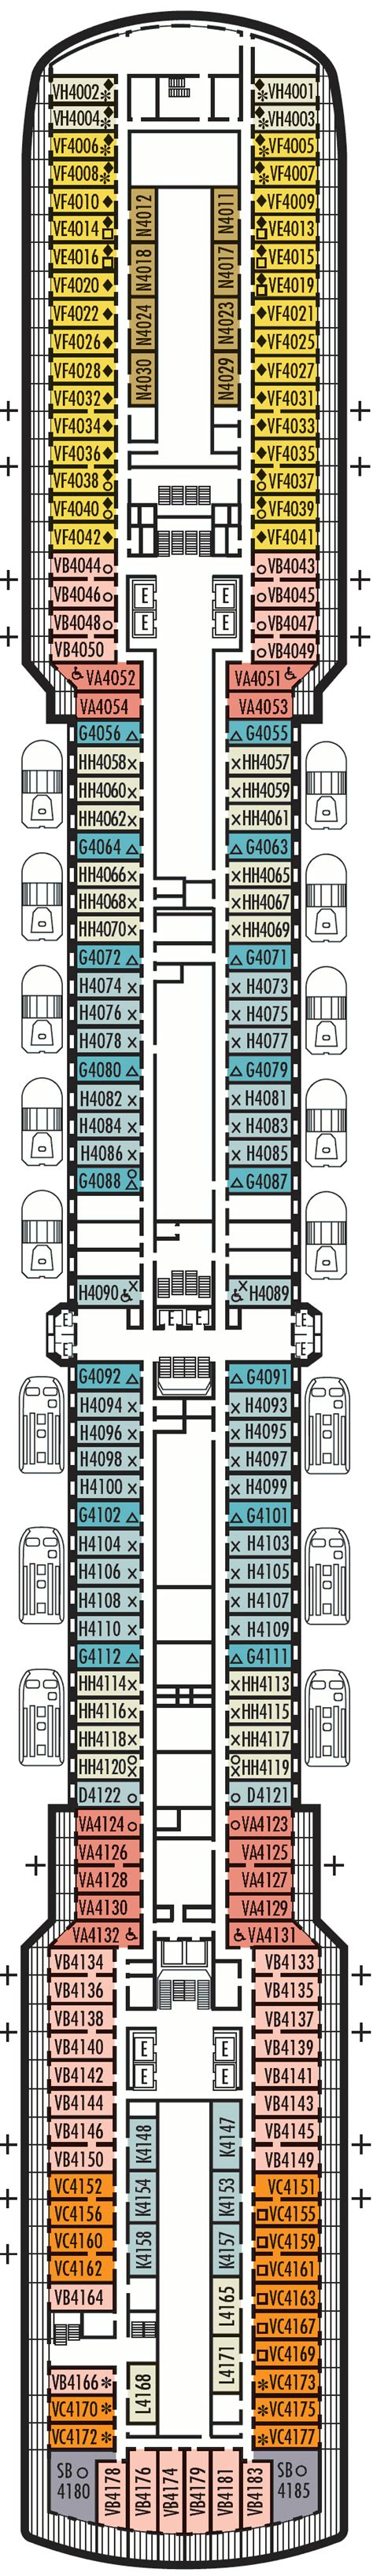 Hal Zuiderdam Deck Plans by Balcony Cabin 4130 On Zuiderdam Category Ej